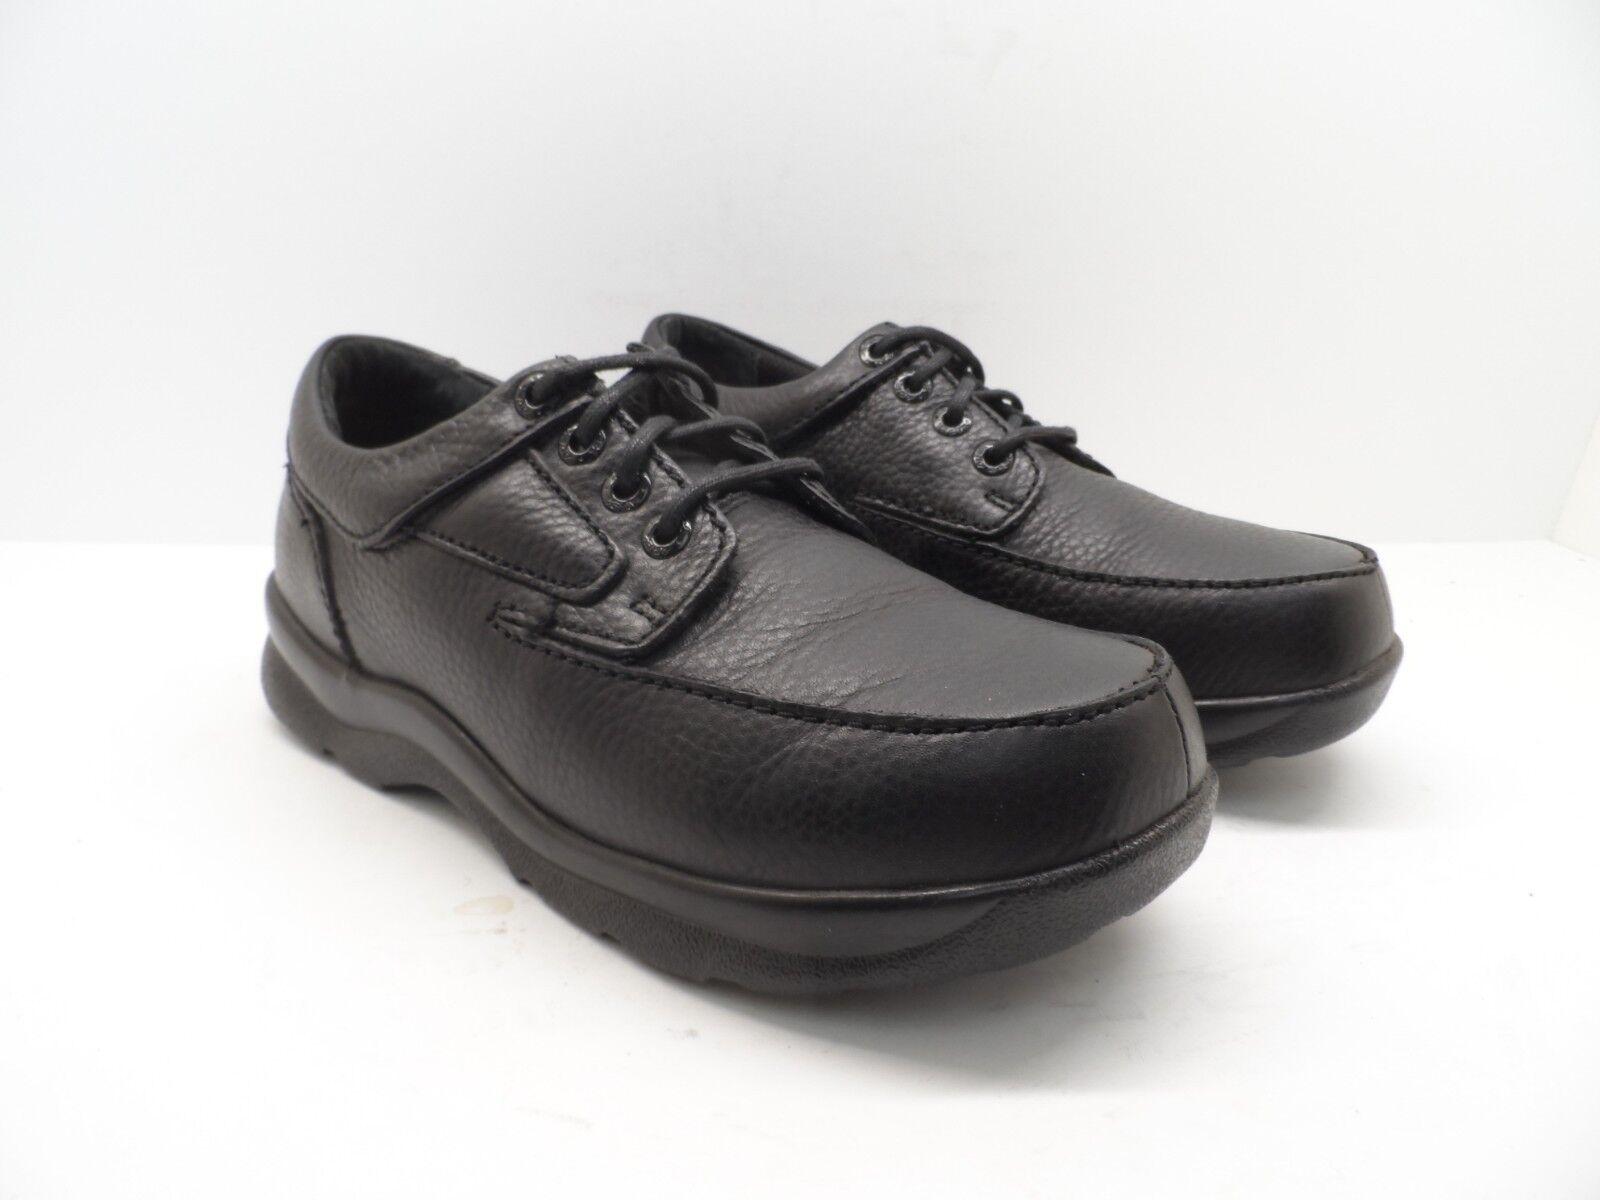 Apex Men's Casual Ariya Moc Toe Oxford Casual Men's Shoes - Y900 Black Size 7.5 Wide e66d23